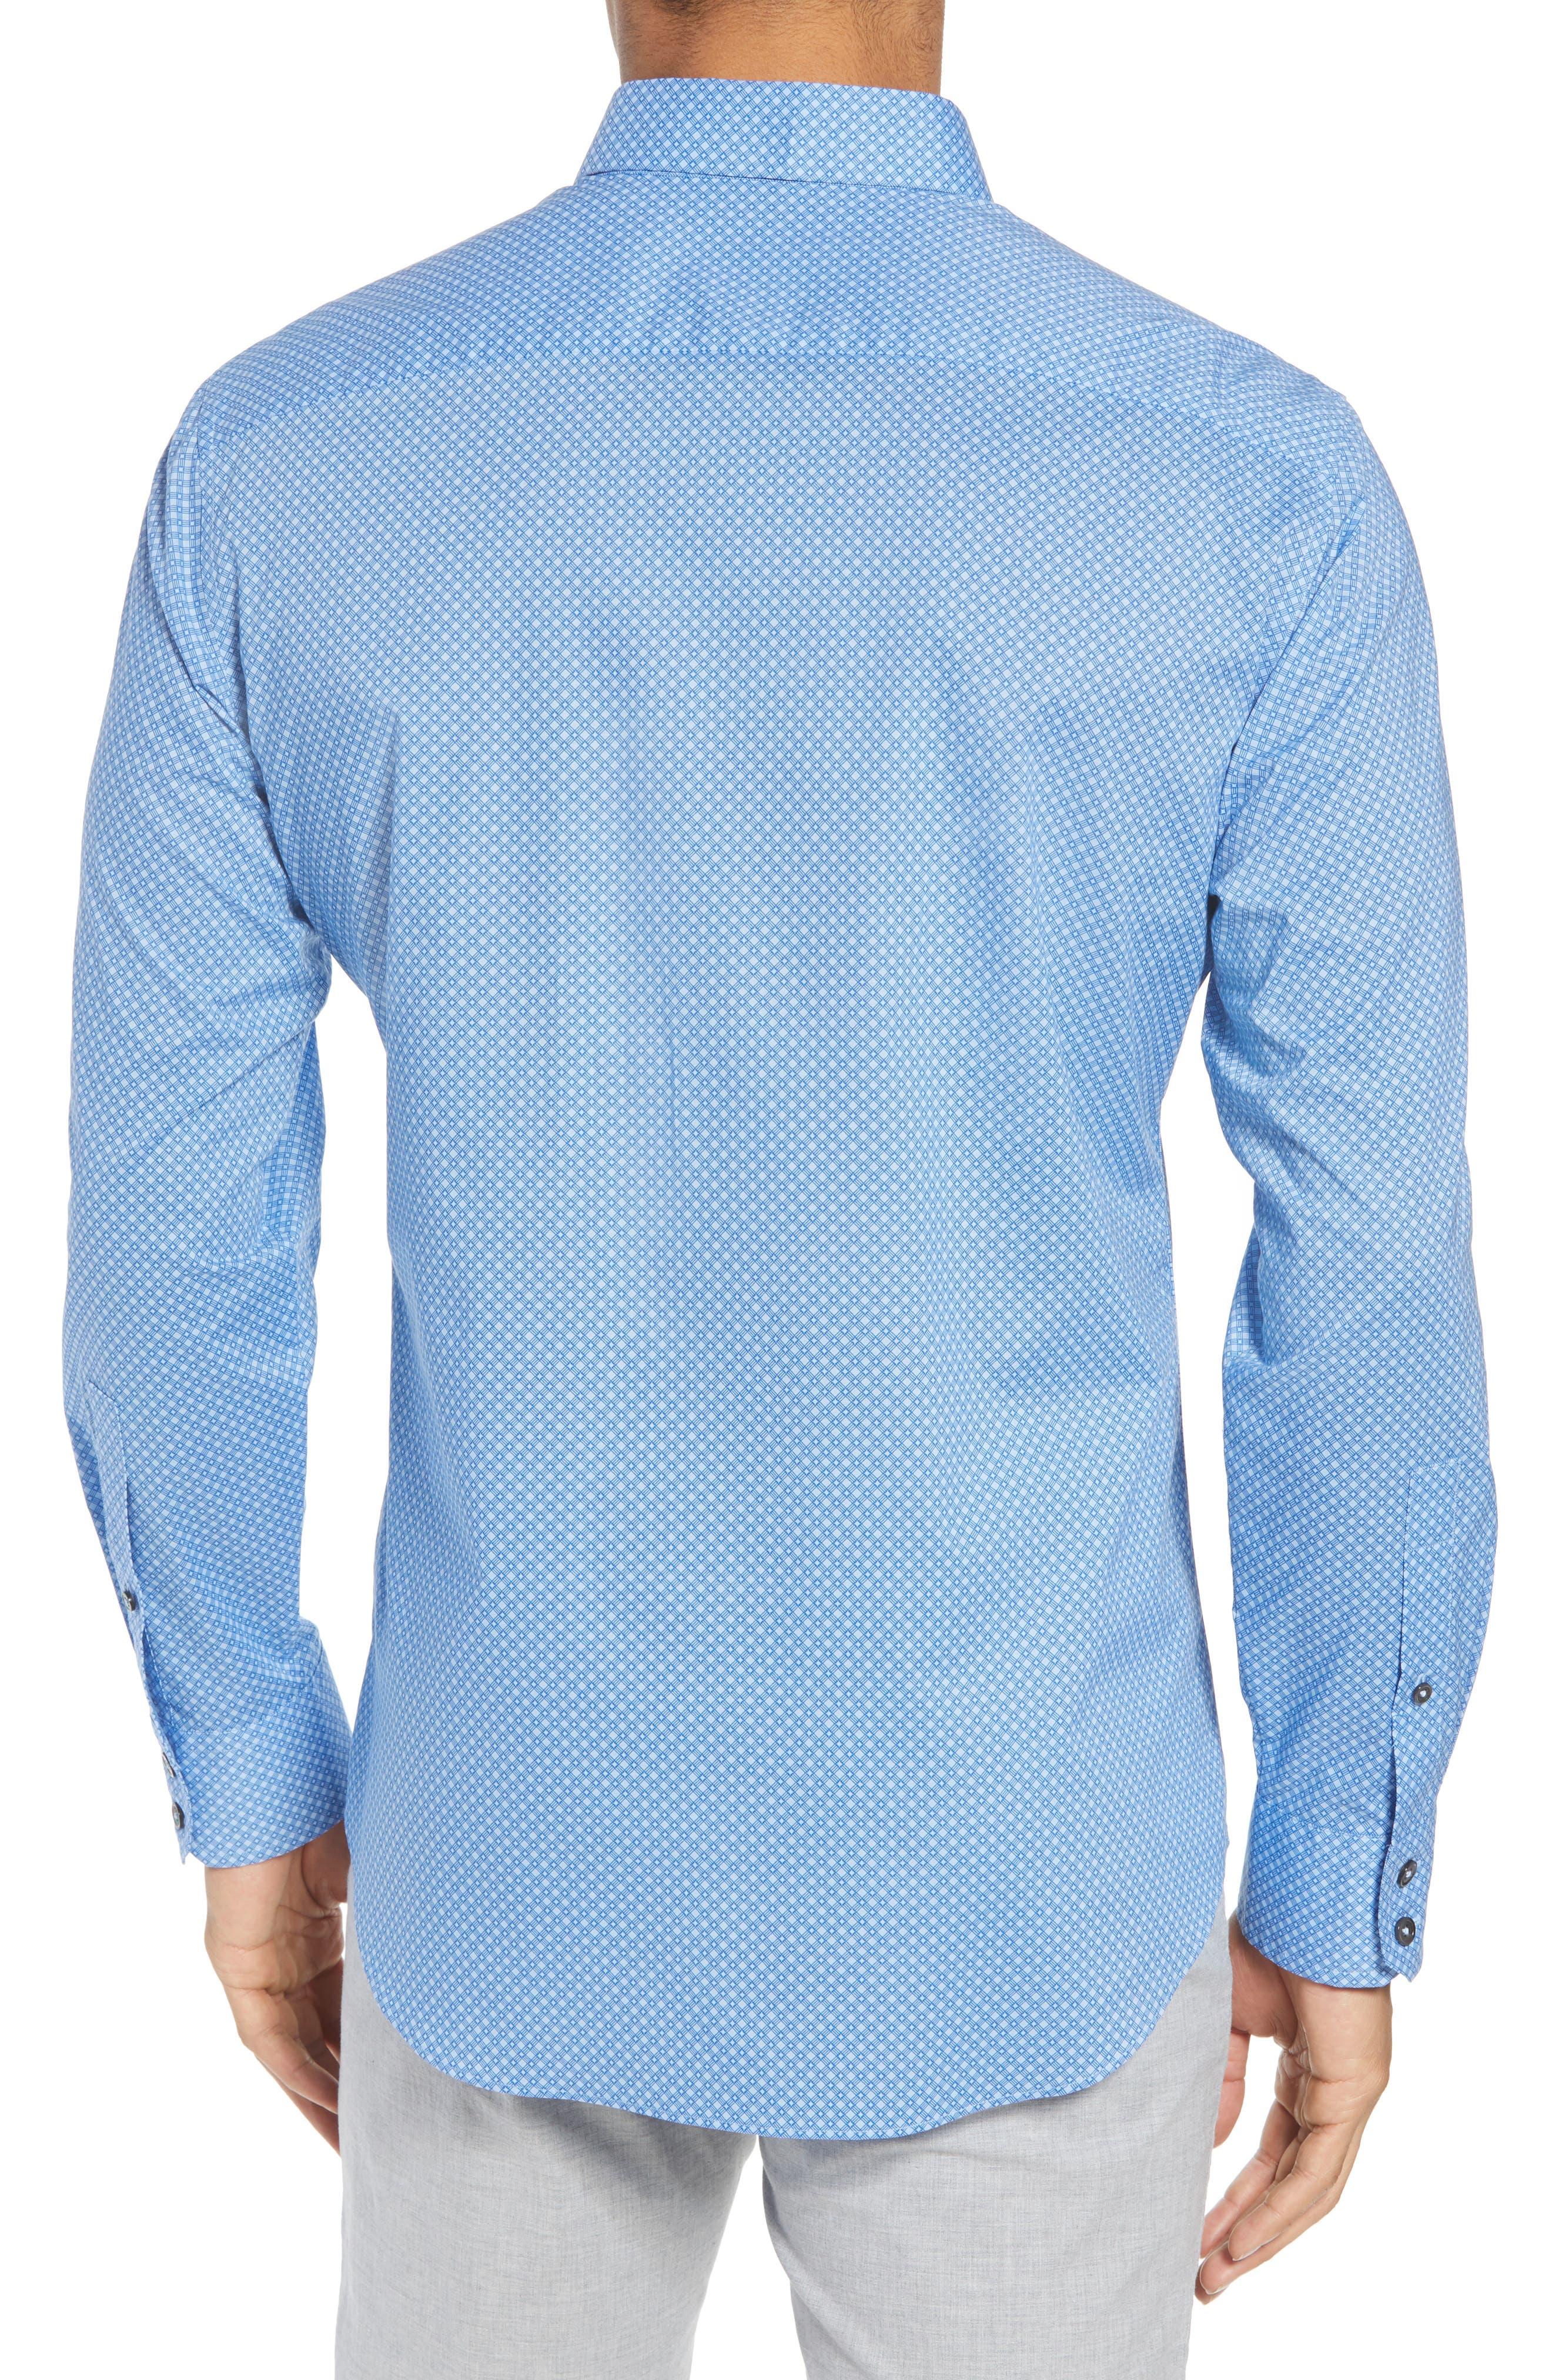 Ethan Slim Fit Sport Shirt,                             Alternate thumbnail 2, color,                             Blue